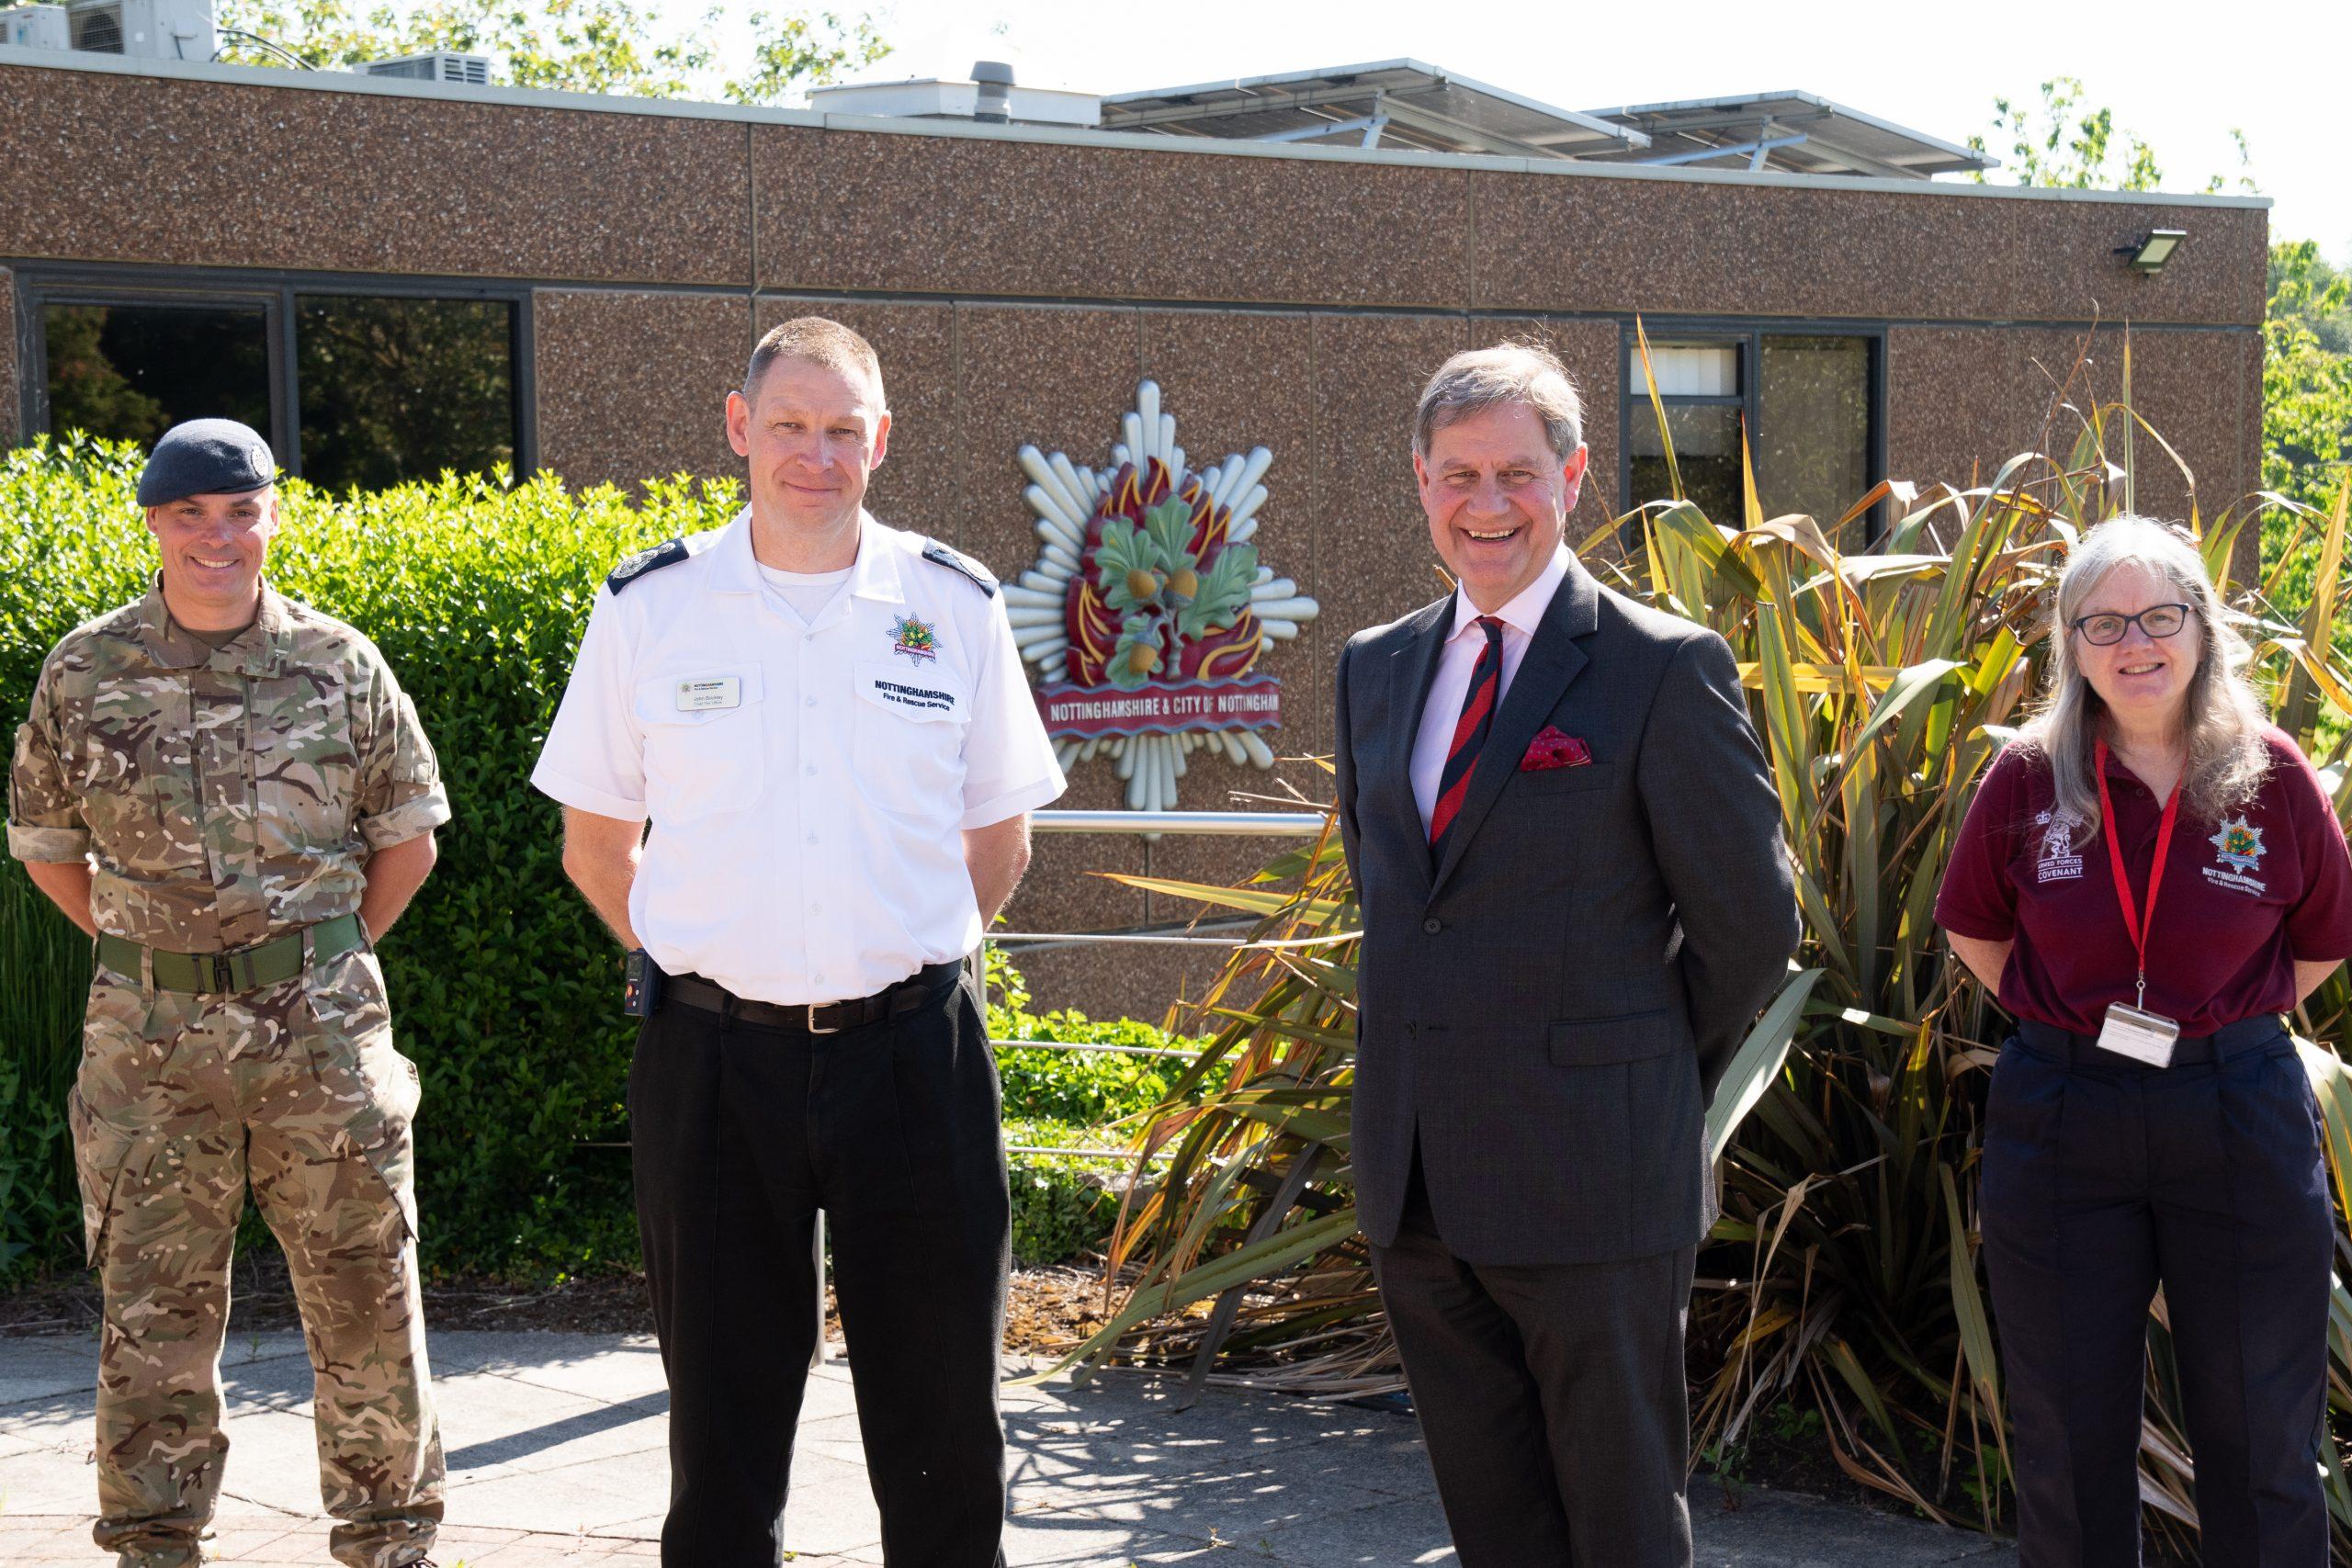 Reservist Mark Collishaw, Chief Fire Officer John Buckley, Major (Ret.) Bruce Spencer and Major (Ret.) Thelma Ward